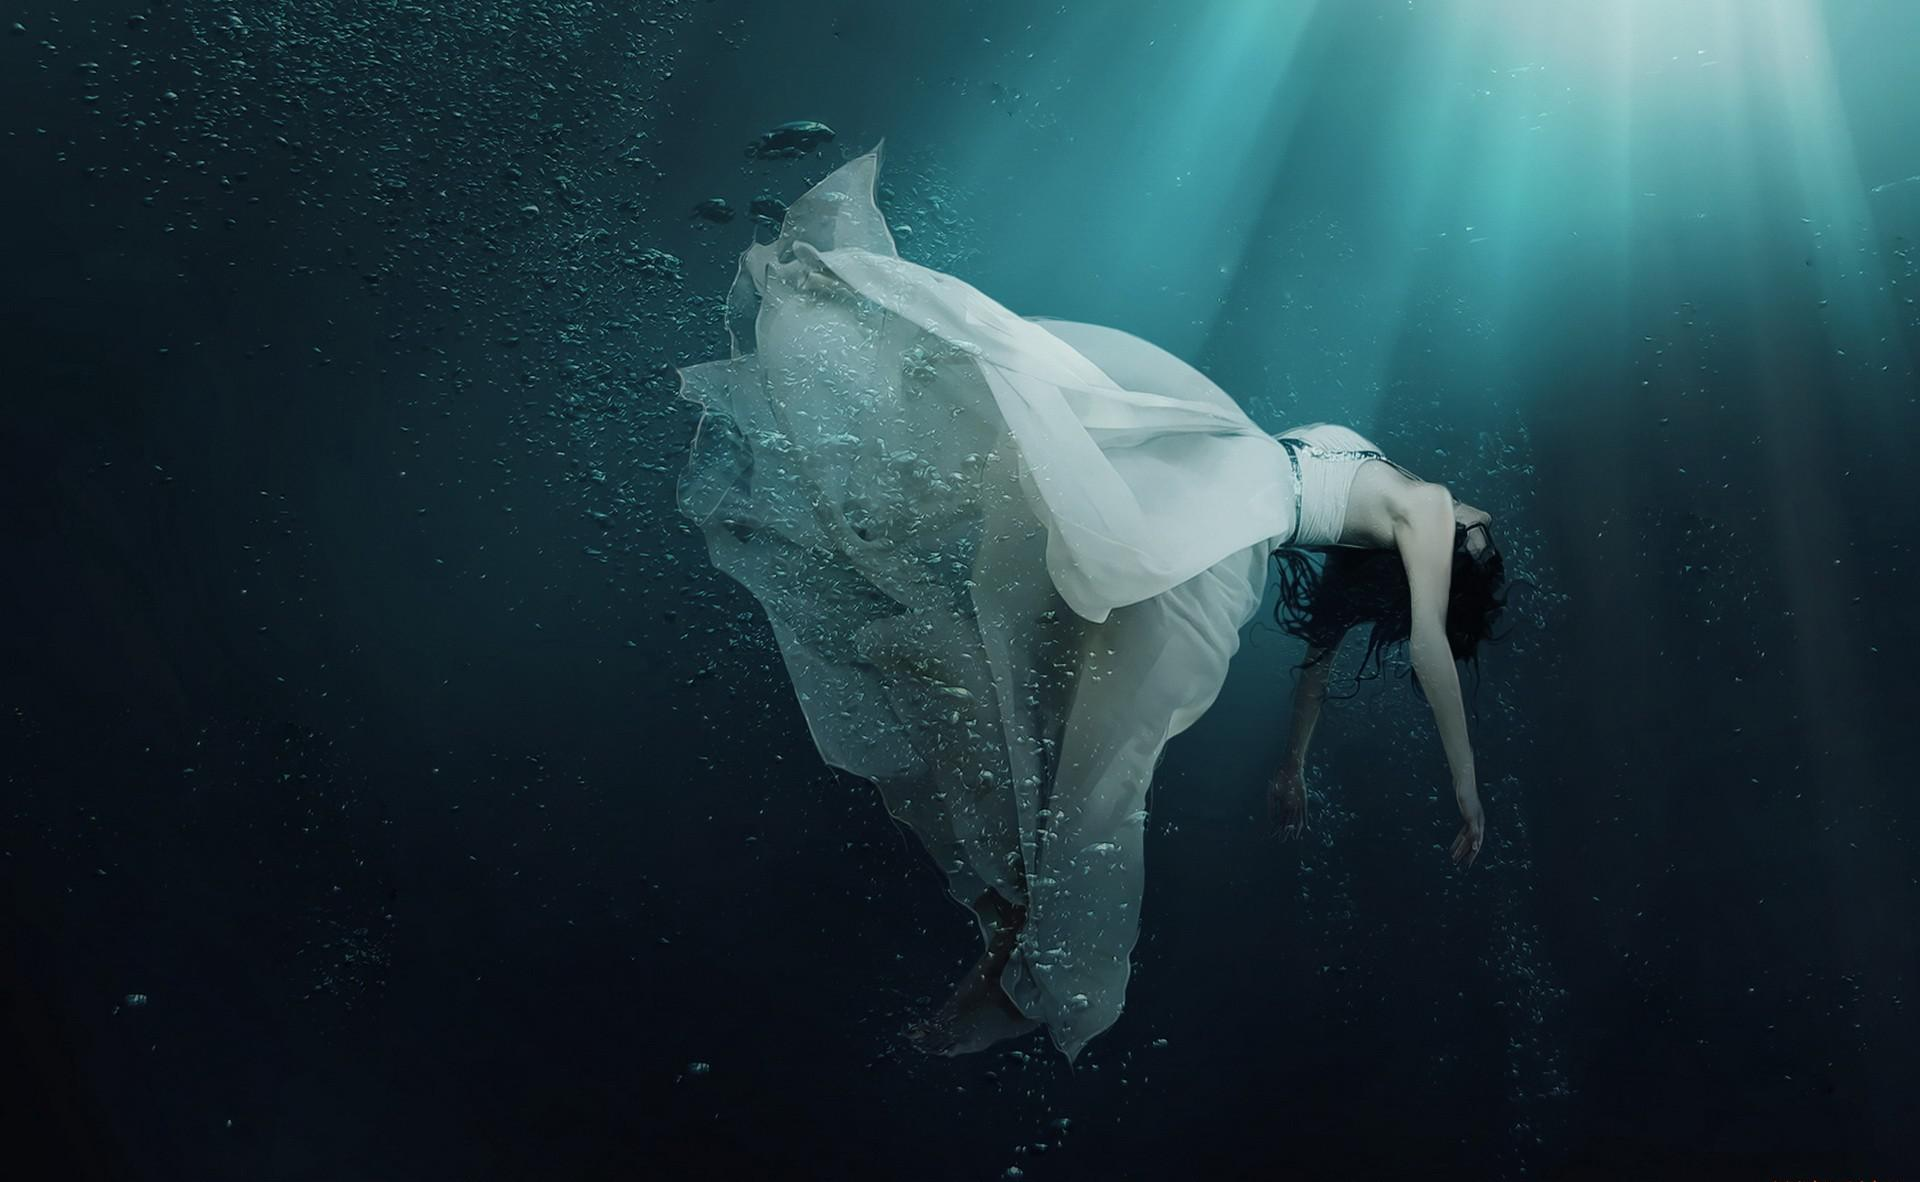 Girl Drowning In Water Widescreen HD Wallpaper   StylishHDWallpapers 1920x1182